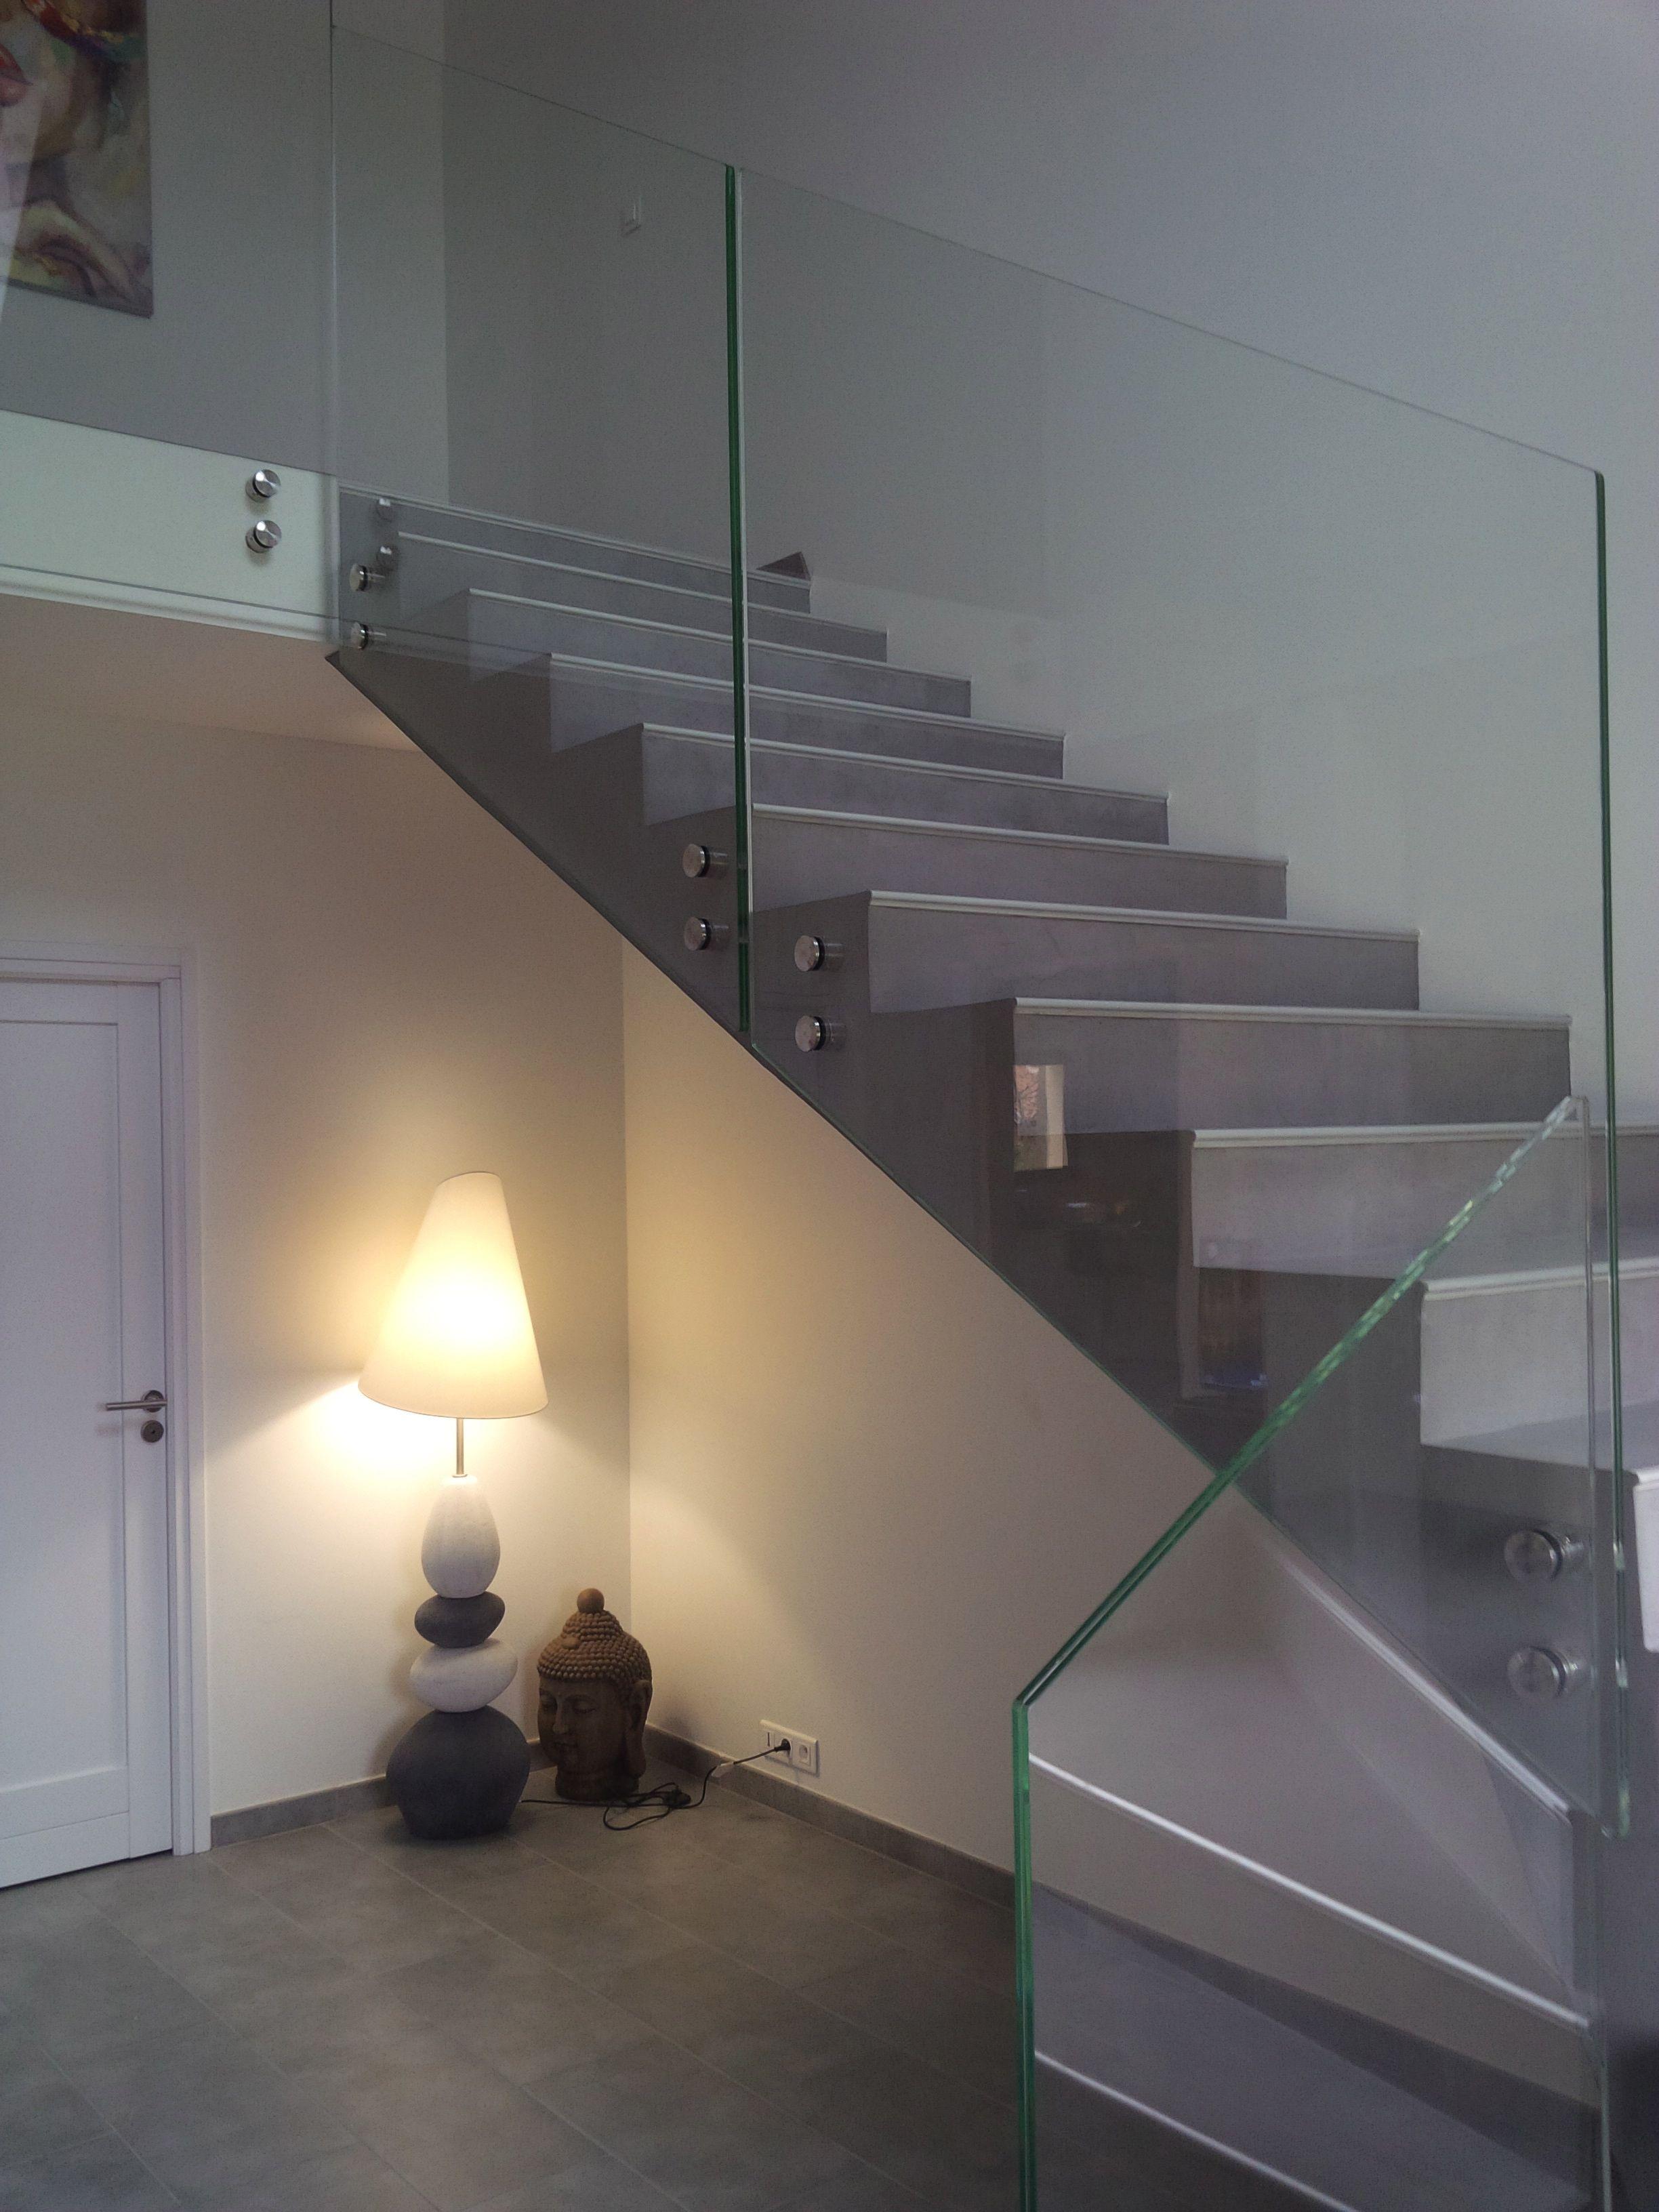 Escalier Interieur Beton Design garde-corps verre glassy | trescalini … | escalier